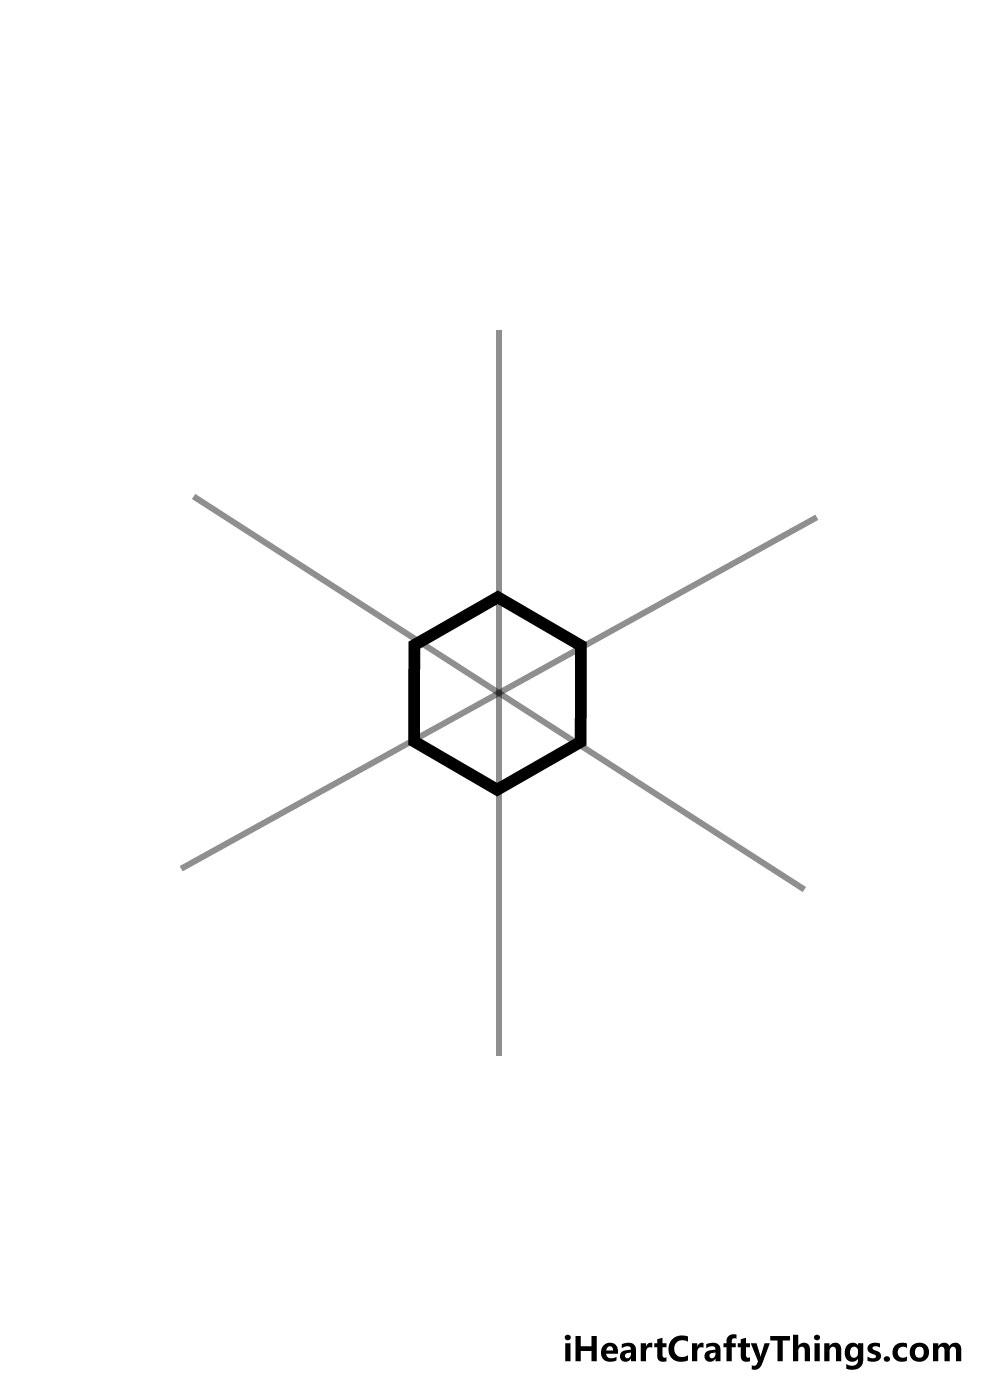 snowflake drawing step 2